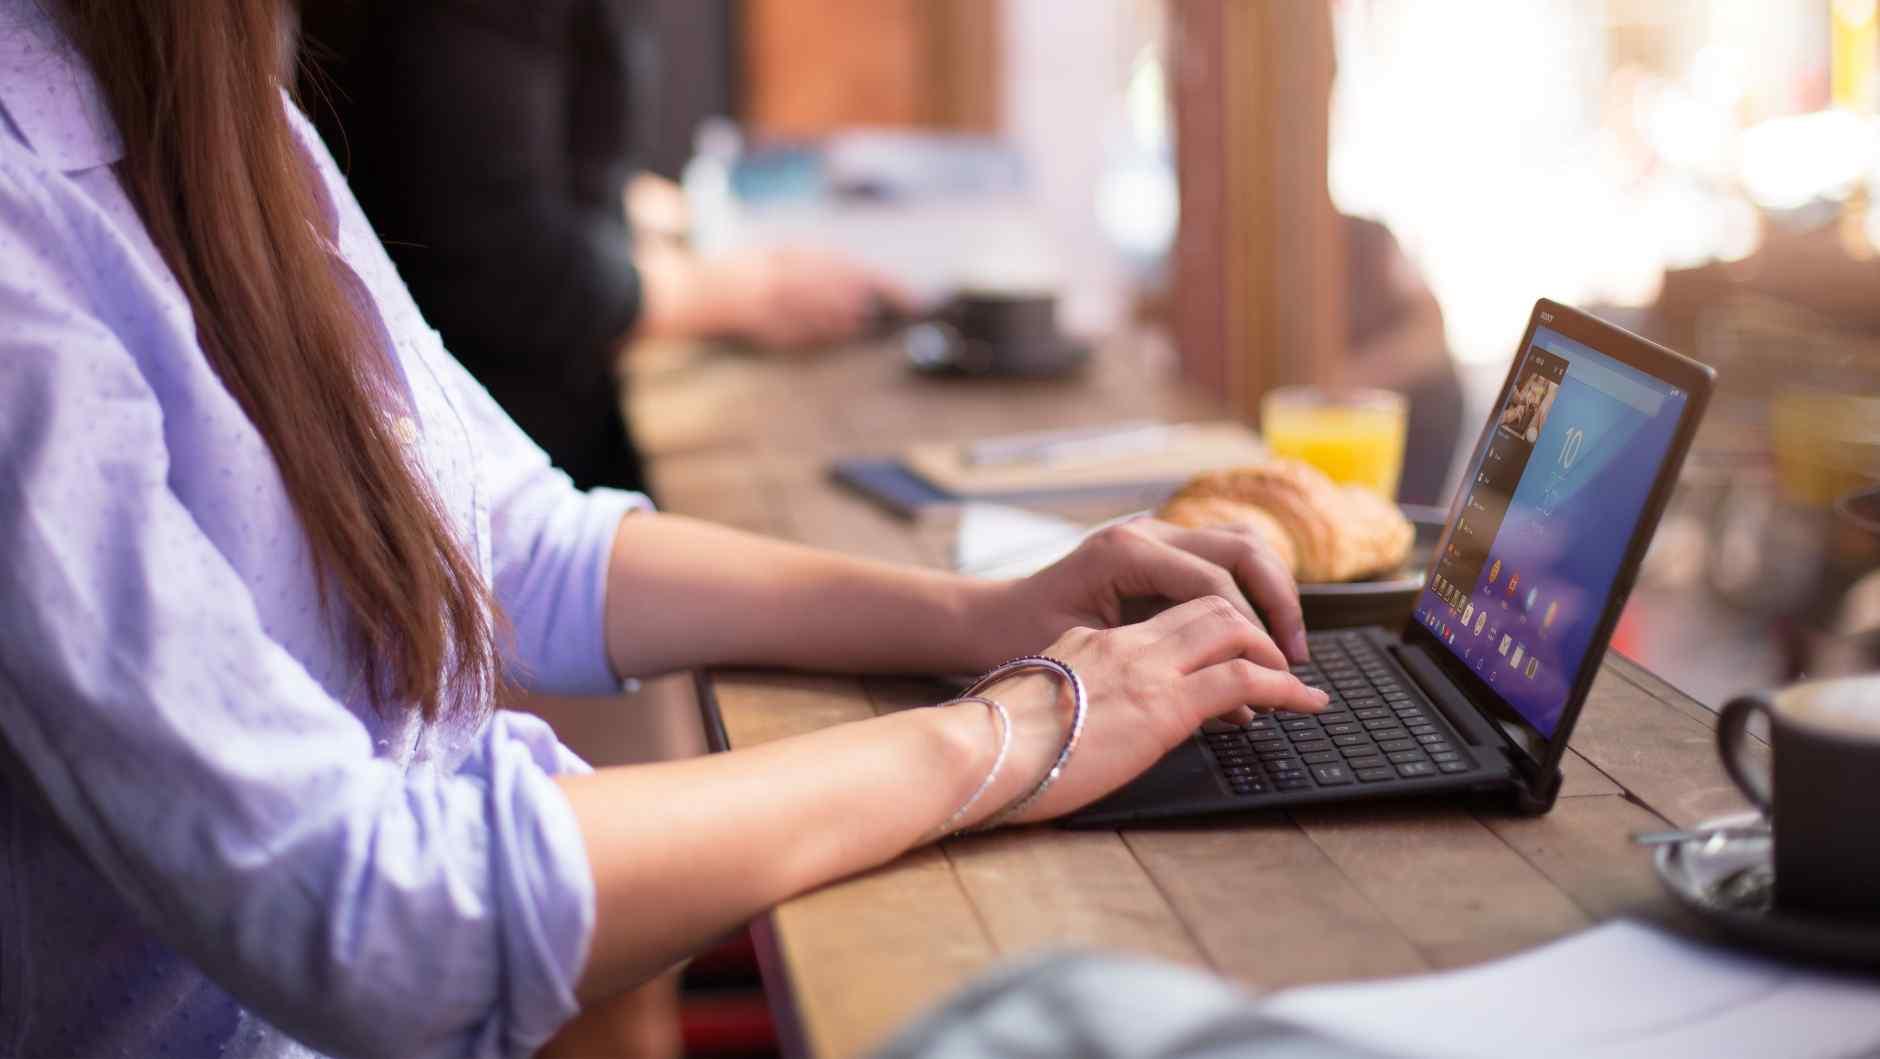 xperia-z4-tablet-business-flexibility-at-your-fingertips-e9e37cea29945b75e01ef49c5d5e15b2-940x2